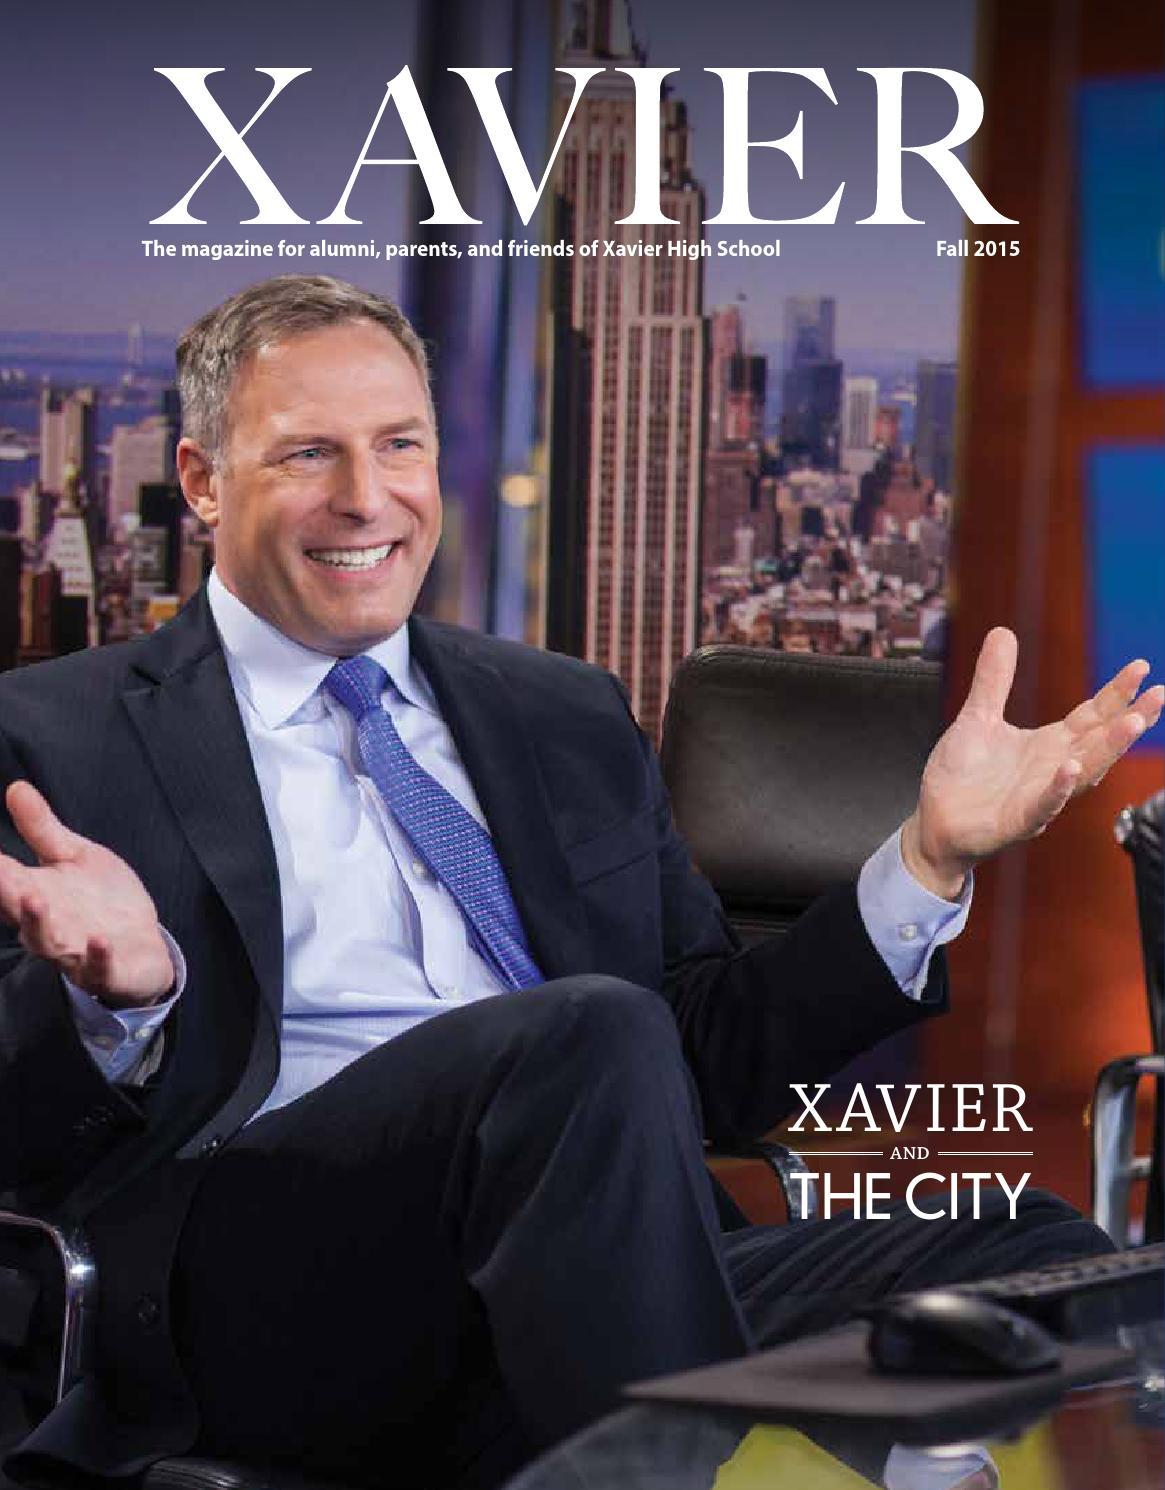 dca25e6a0b6 Xavier Magazine: Fall 2015 by Xavier High School - issuu